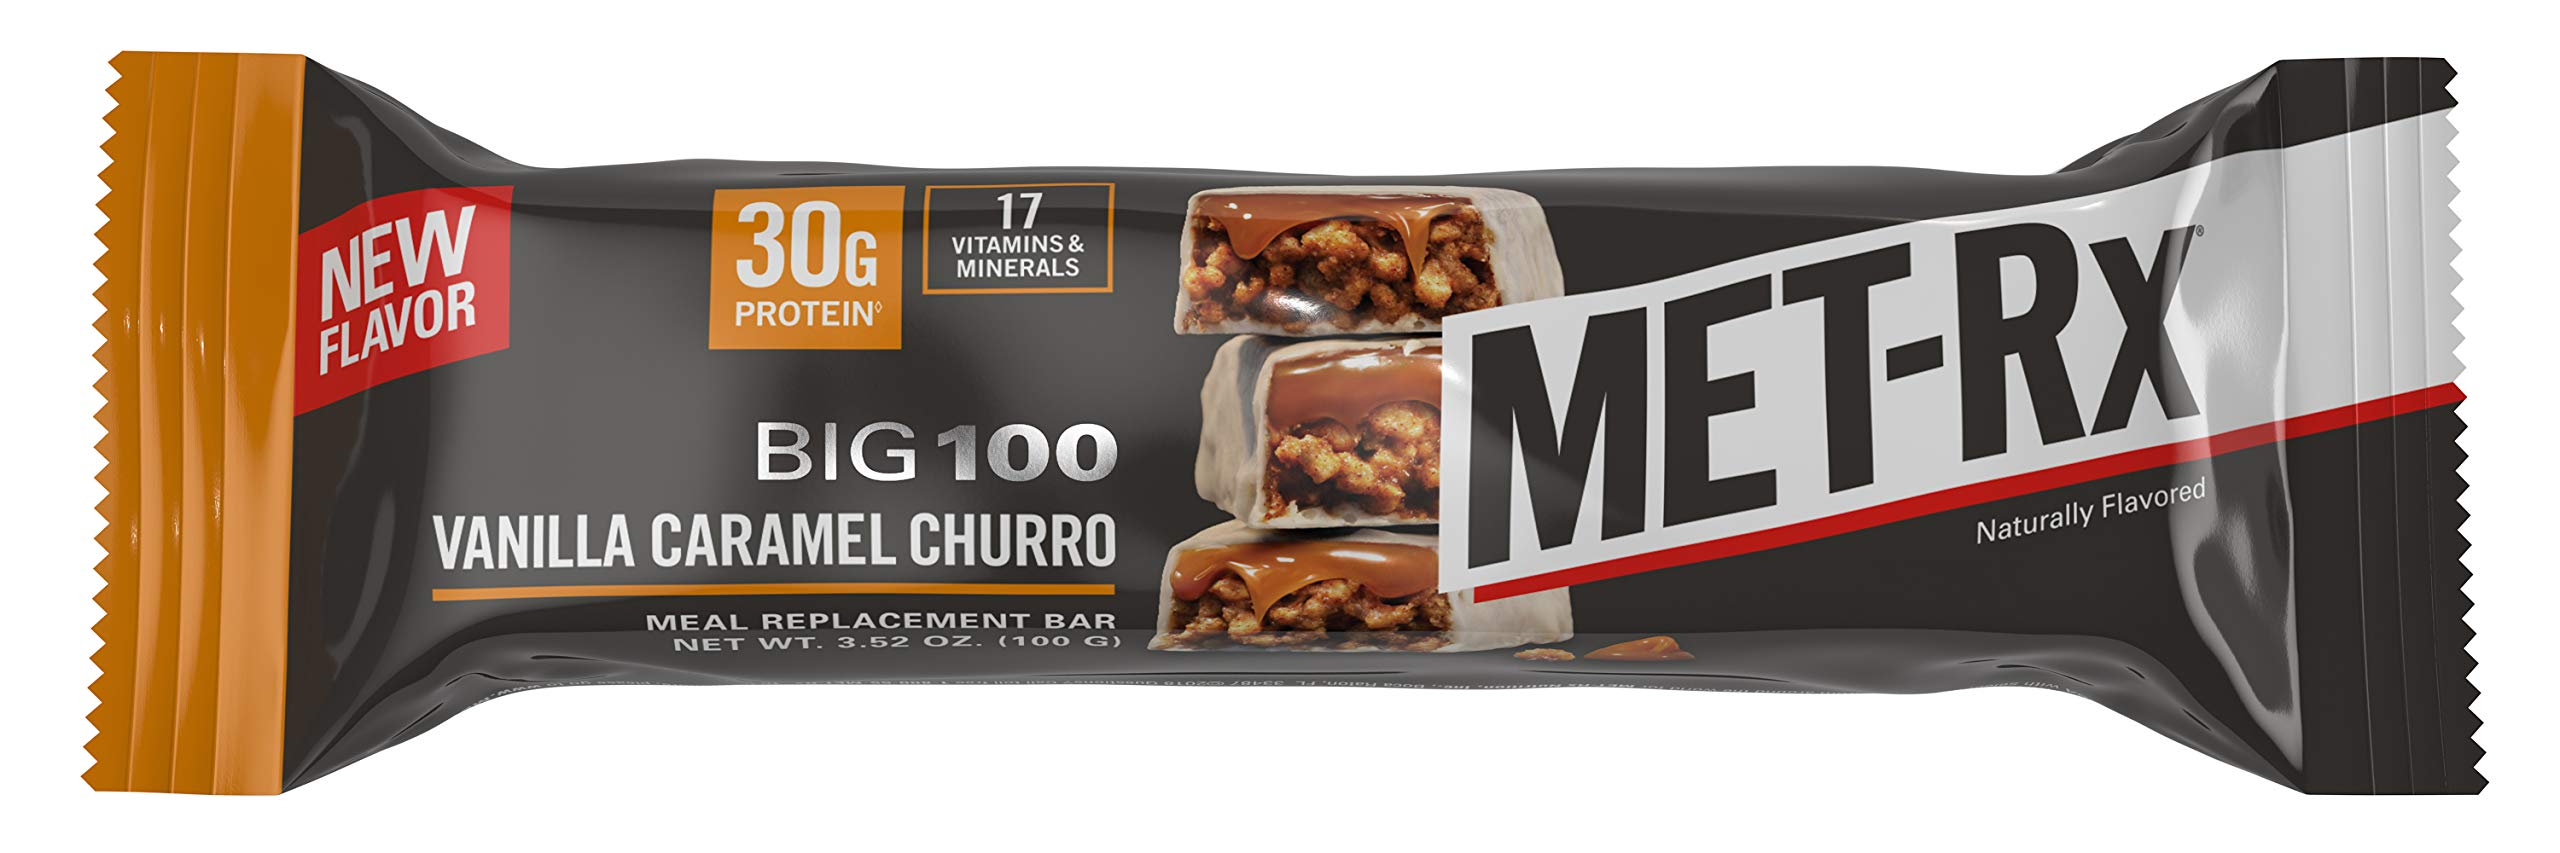 MET-Rx Big 100 Colossal Vanilla Caramel Churro Bar, 9 Count